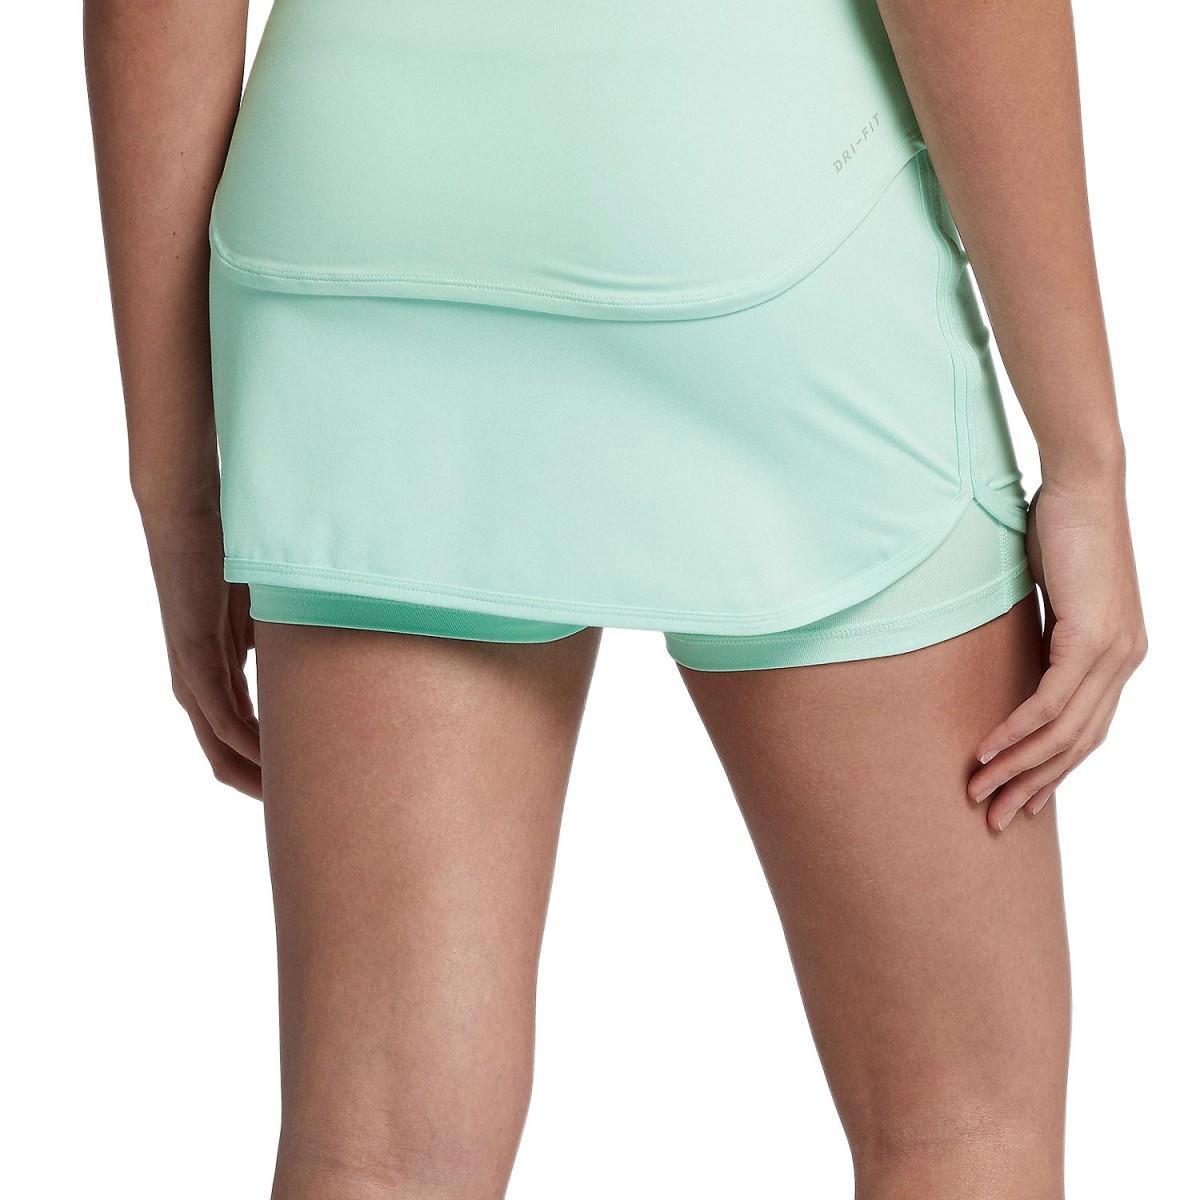 Теннисная юбка женская Nike Court Pure Skirt igloo/white